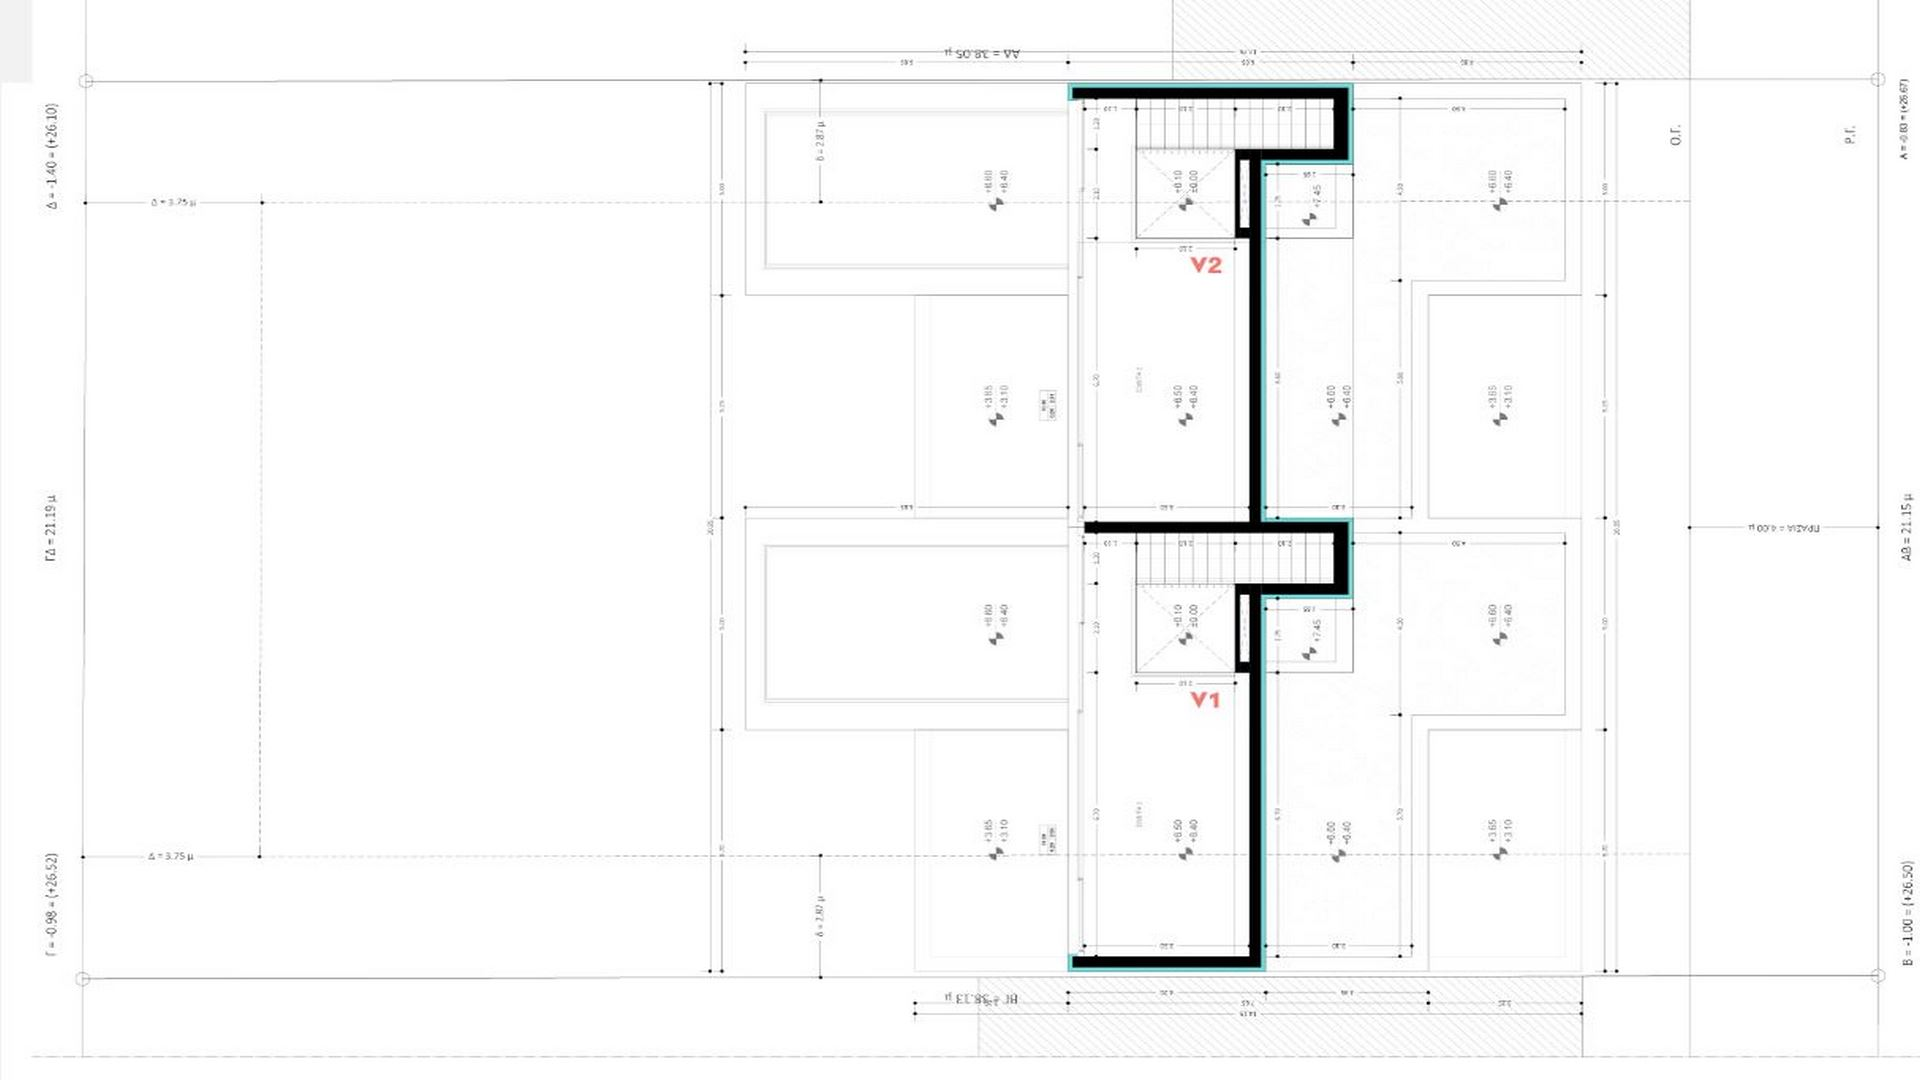 Second floor (Αντιγραφή)